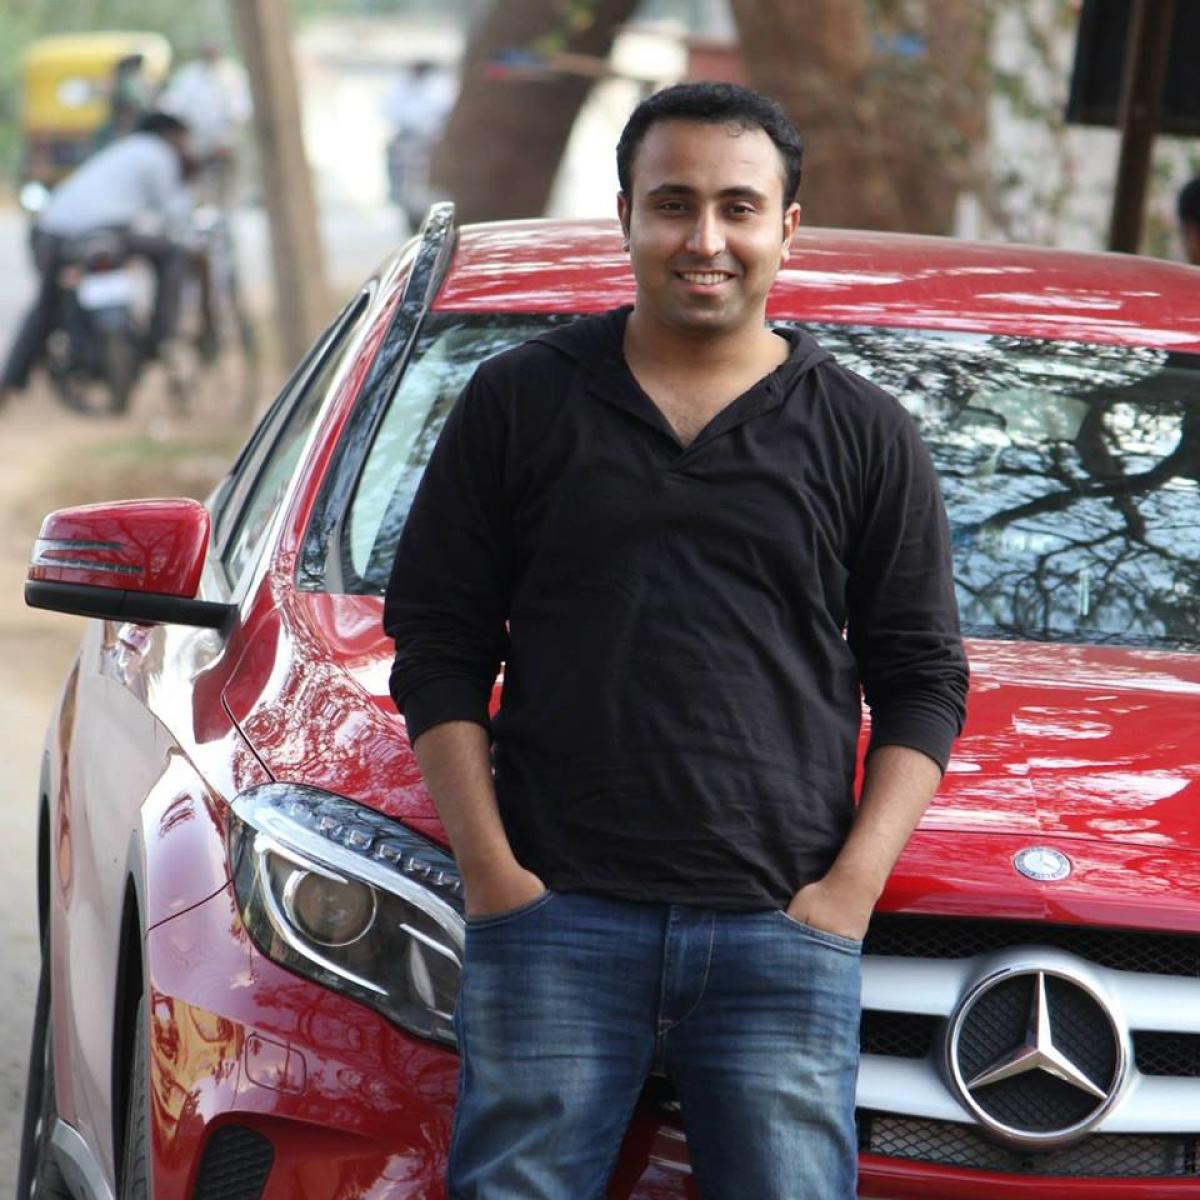 The missing techie, Kumar Ajitabh